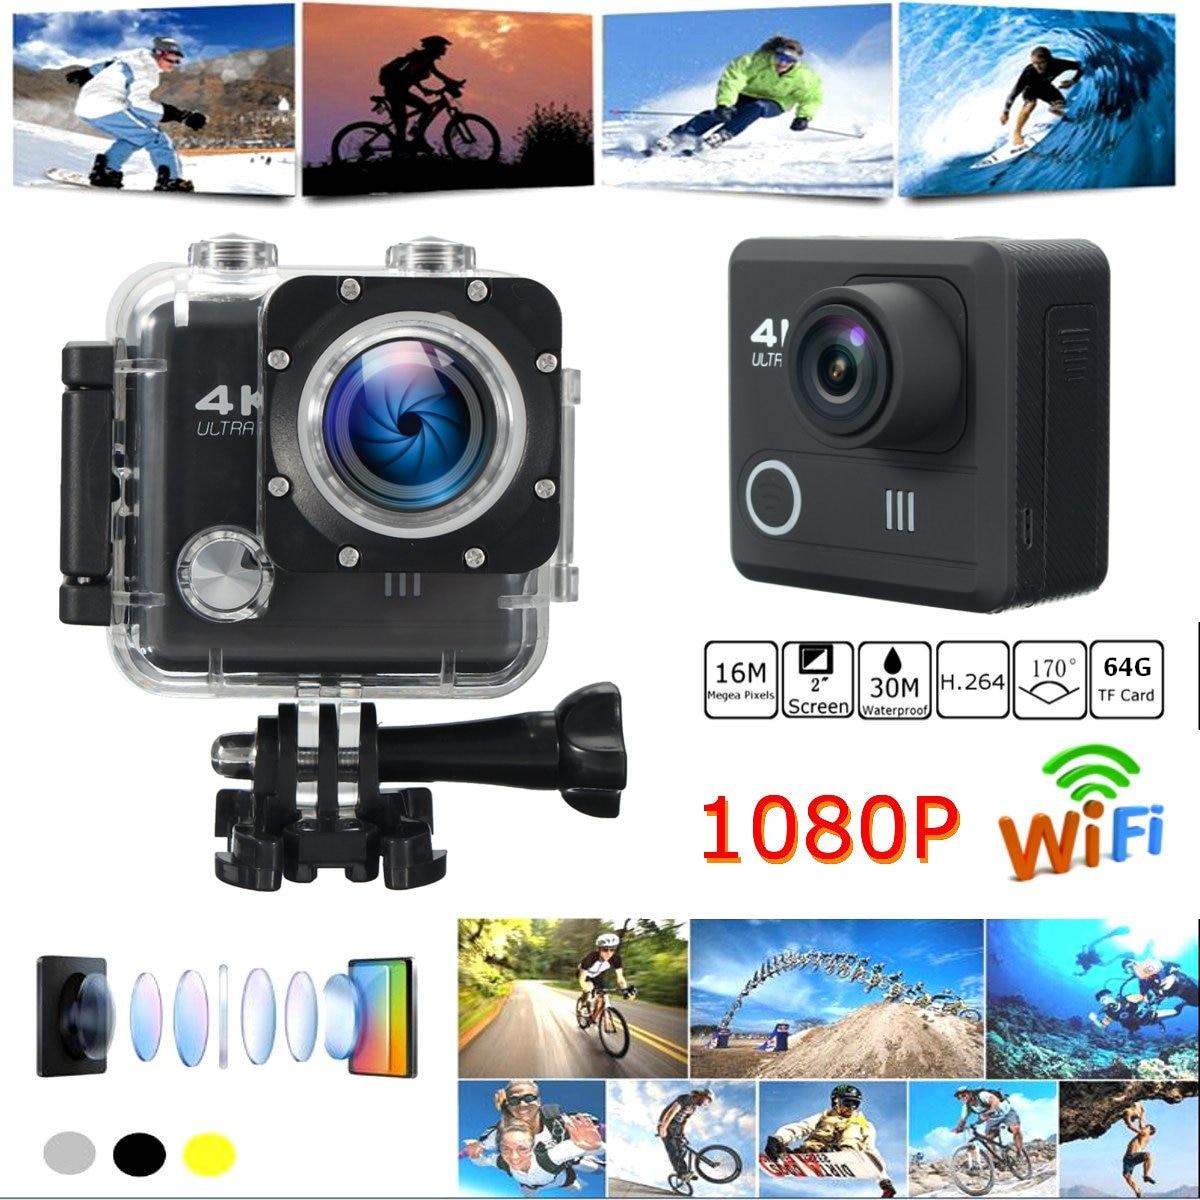 4K 16MP WIFI Sport Action Video Camera 2 inch DV 1080P HD Cam DVR Waterproof Remote 2017 arrival original eken action camera h9 h9r 4k sport camera with remote hd wifi 1080p 30fps go waterproof pro actoin cam